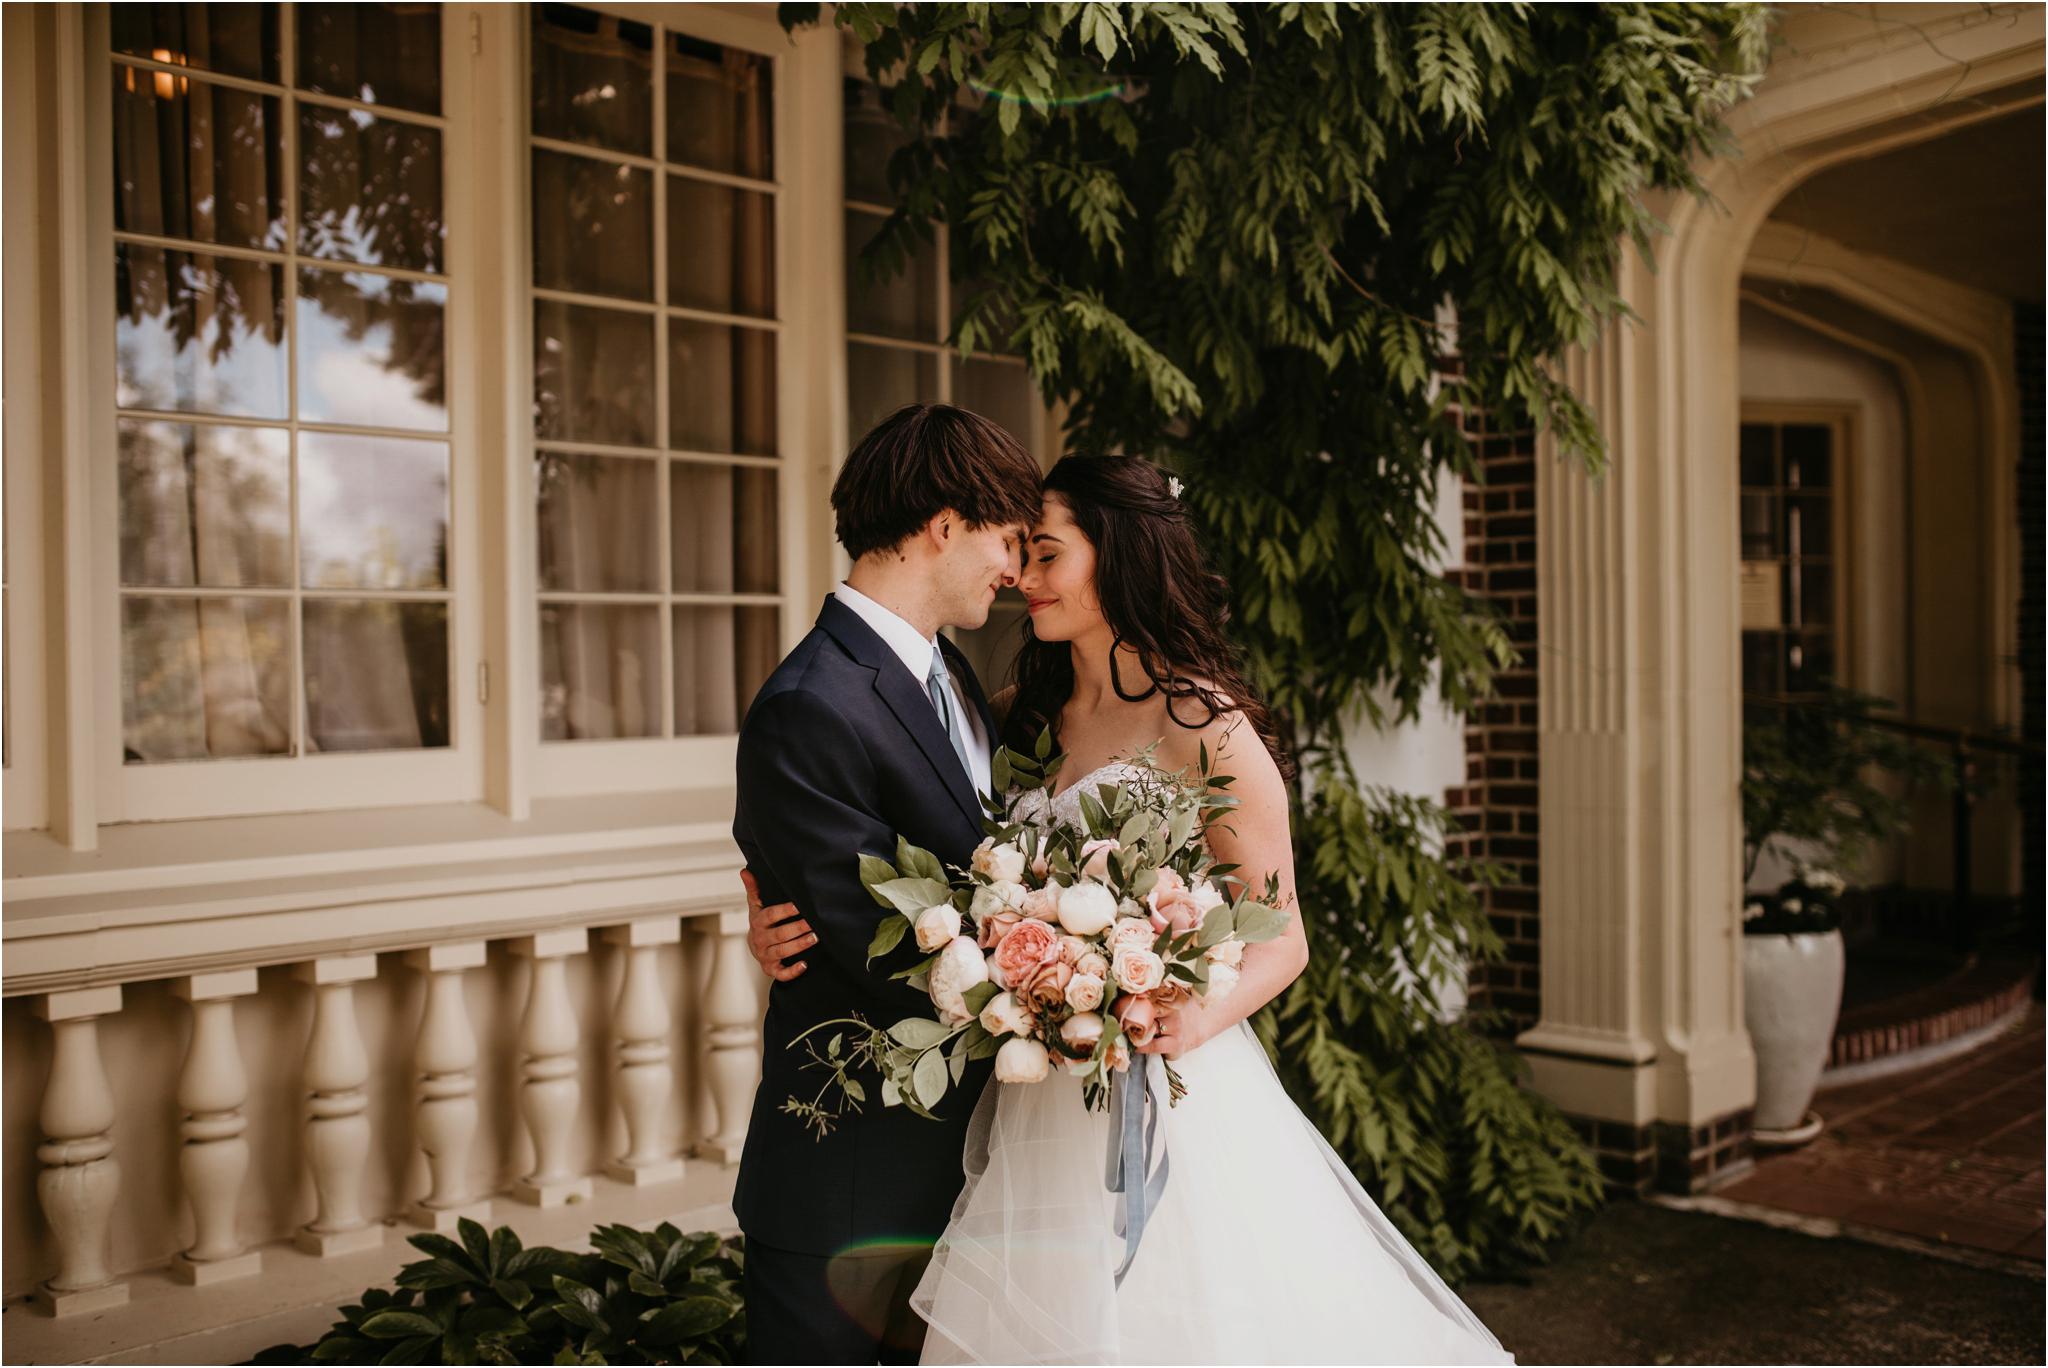 chance-and-ondrea-lairmont-manor-wedding-seattle-photographer-039.jpg